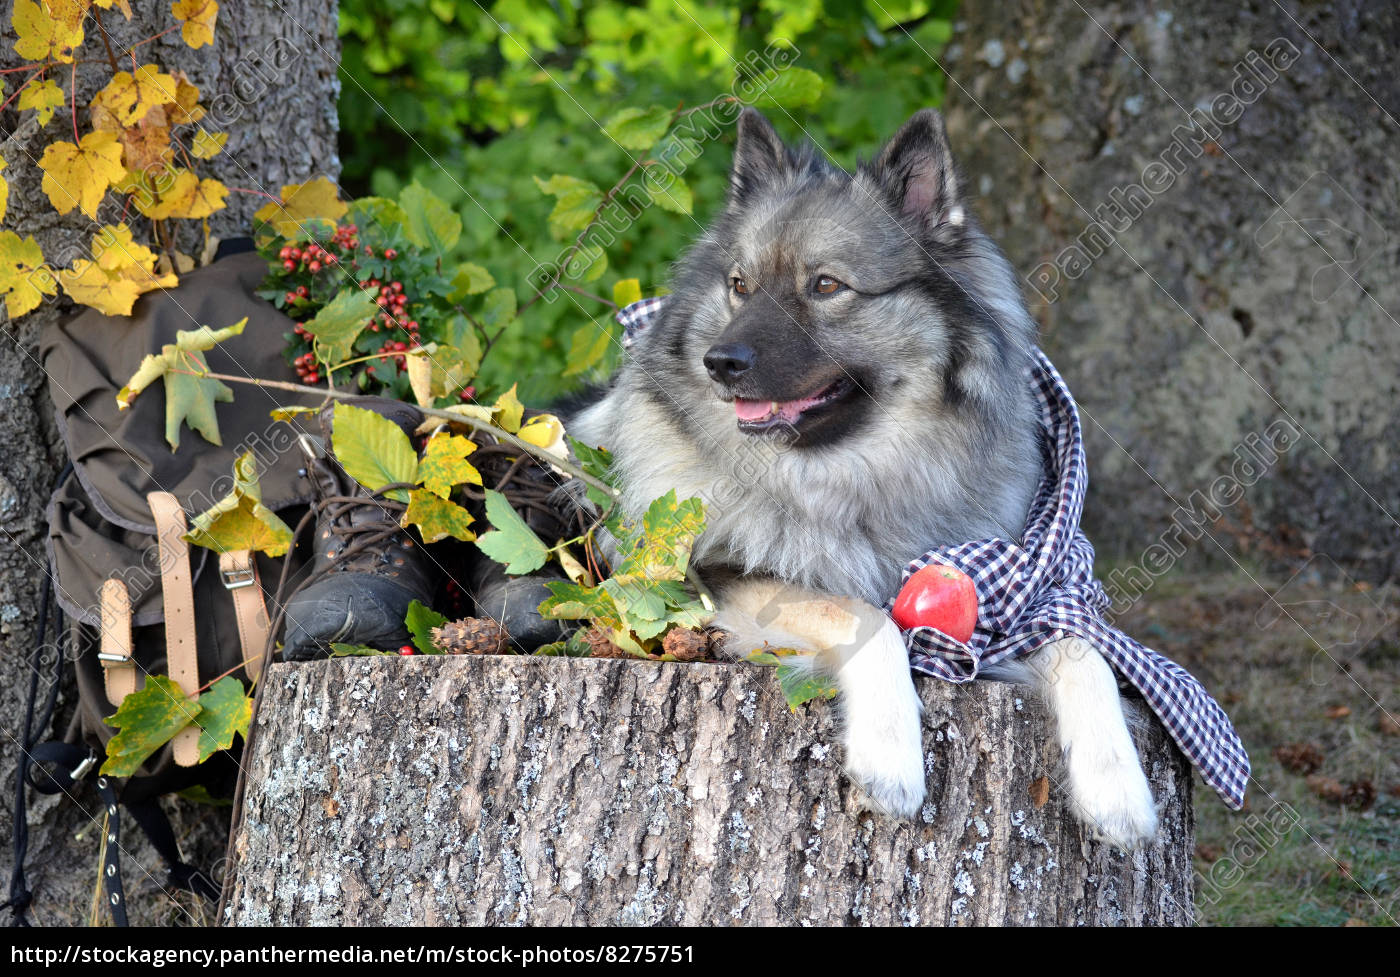 Lizenzfreies Bild 8275751 Hund Herbst Pause Wandern